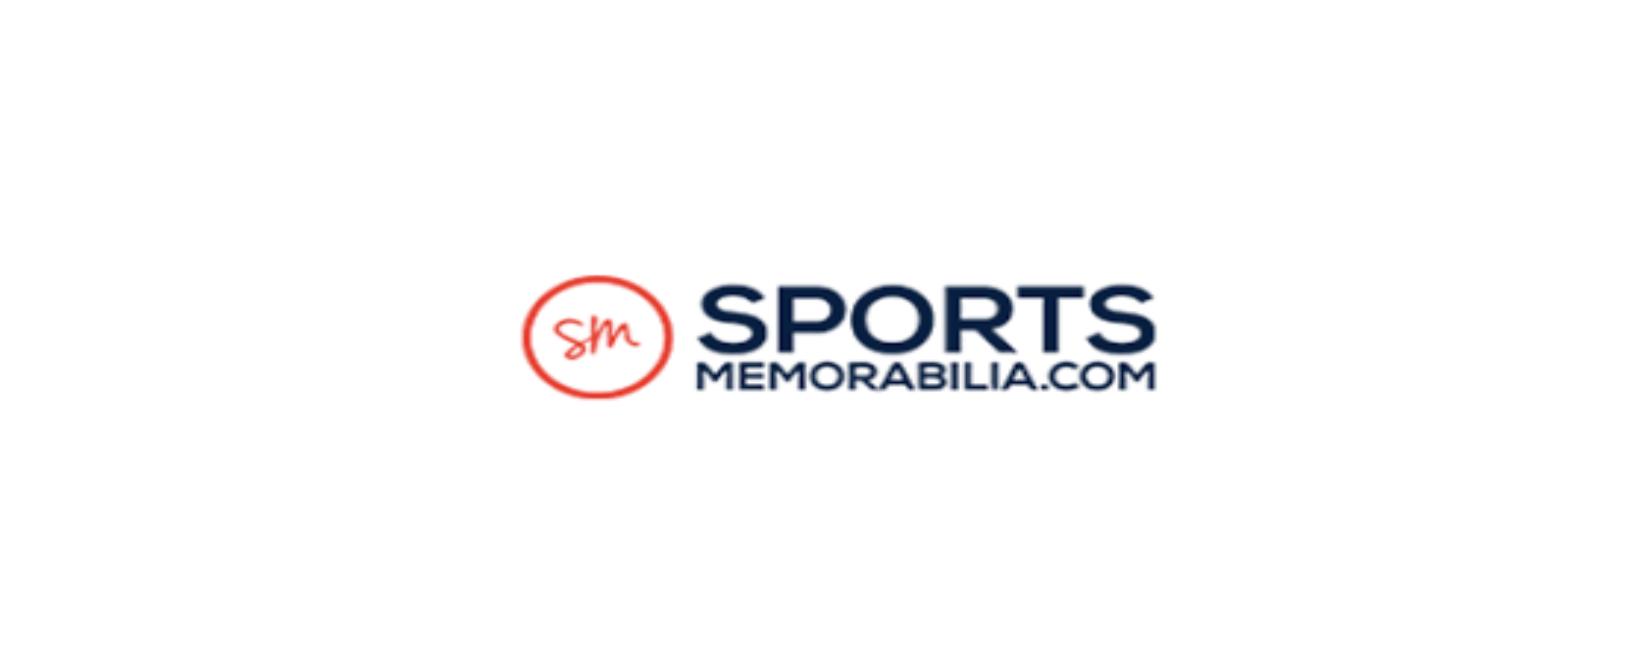 Sports Memorabilia Discount Code 2021